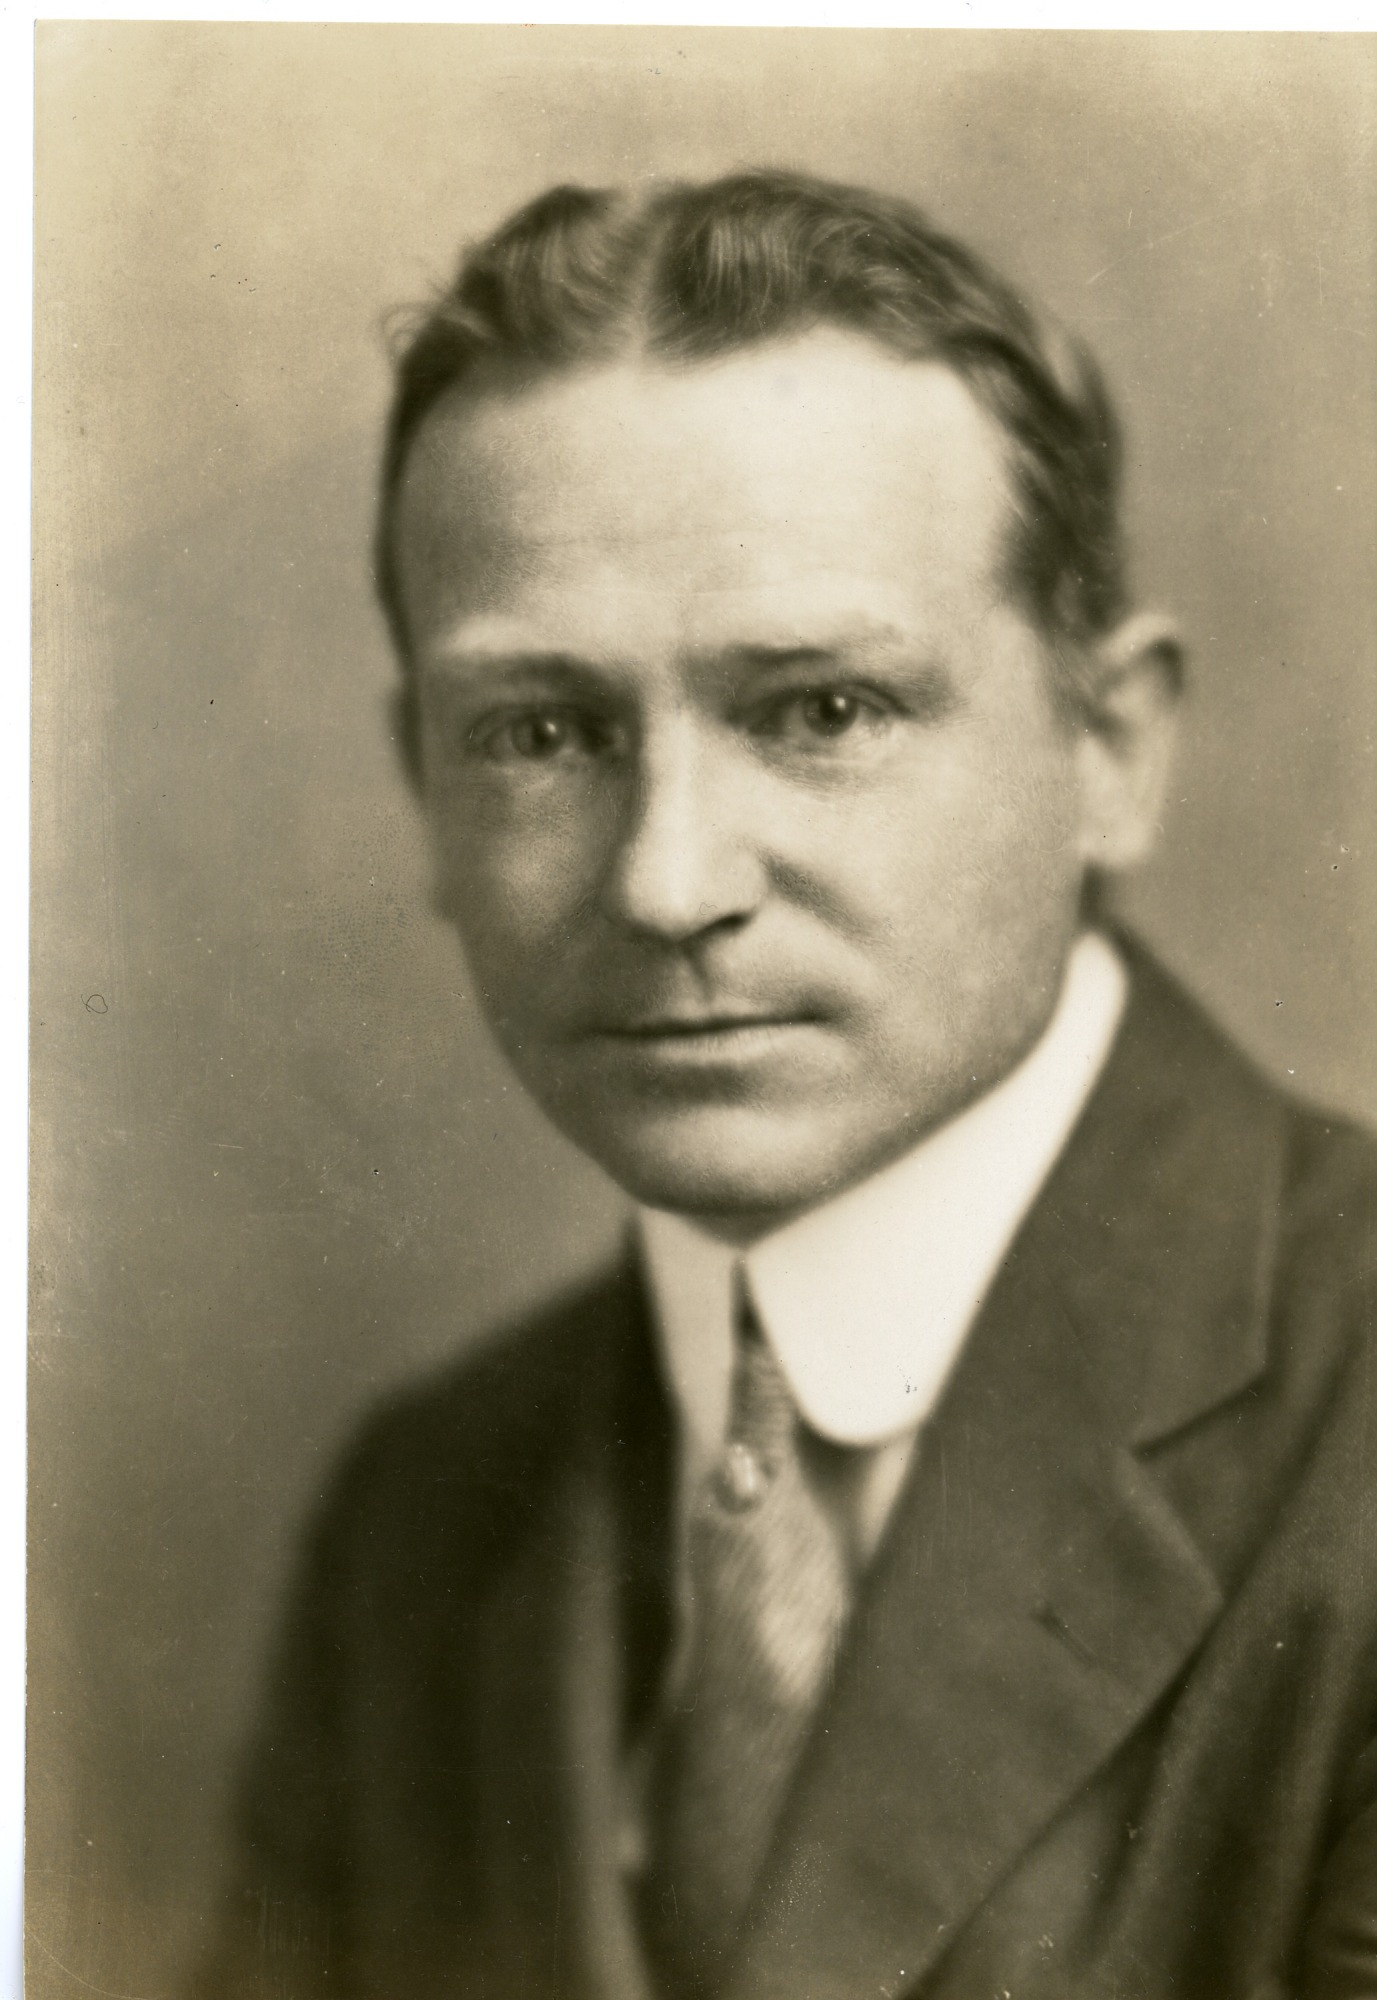 Austin Hobart Clark (1880-1954), Smithsonian Institution Archives, SIA Acc. 90-105 [SIA2007-0009].